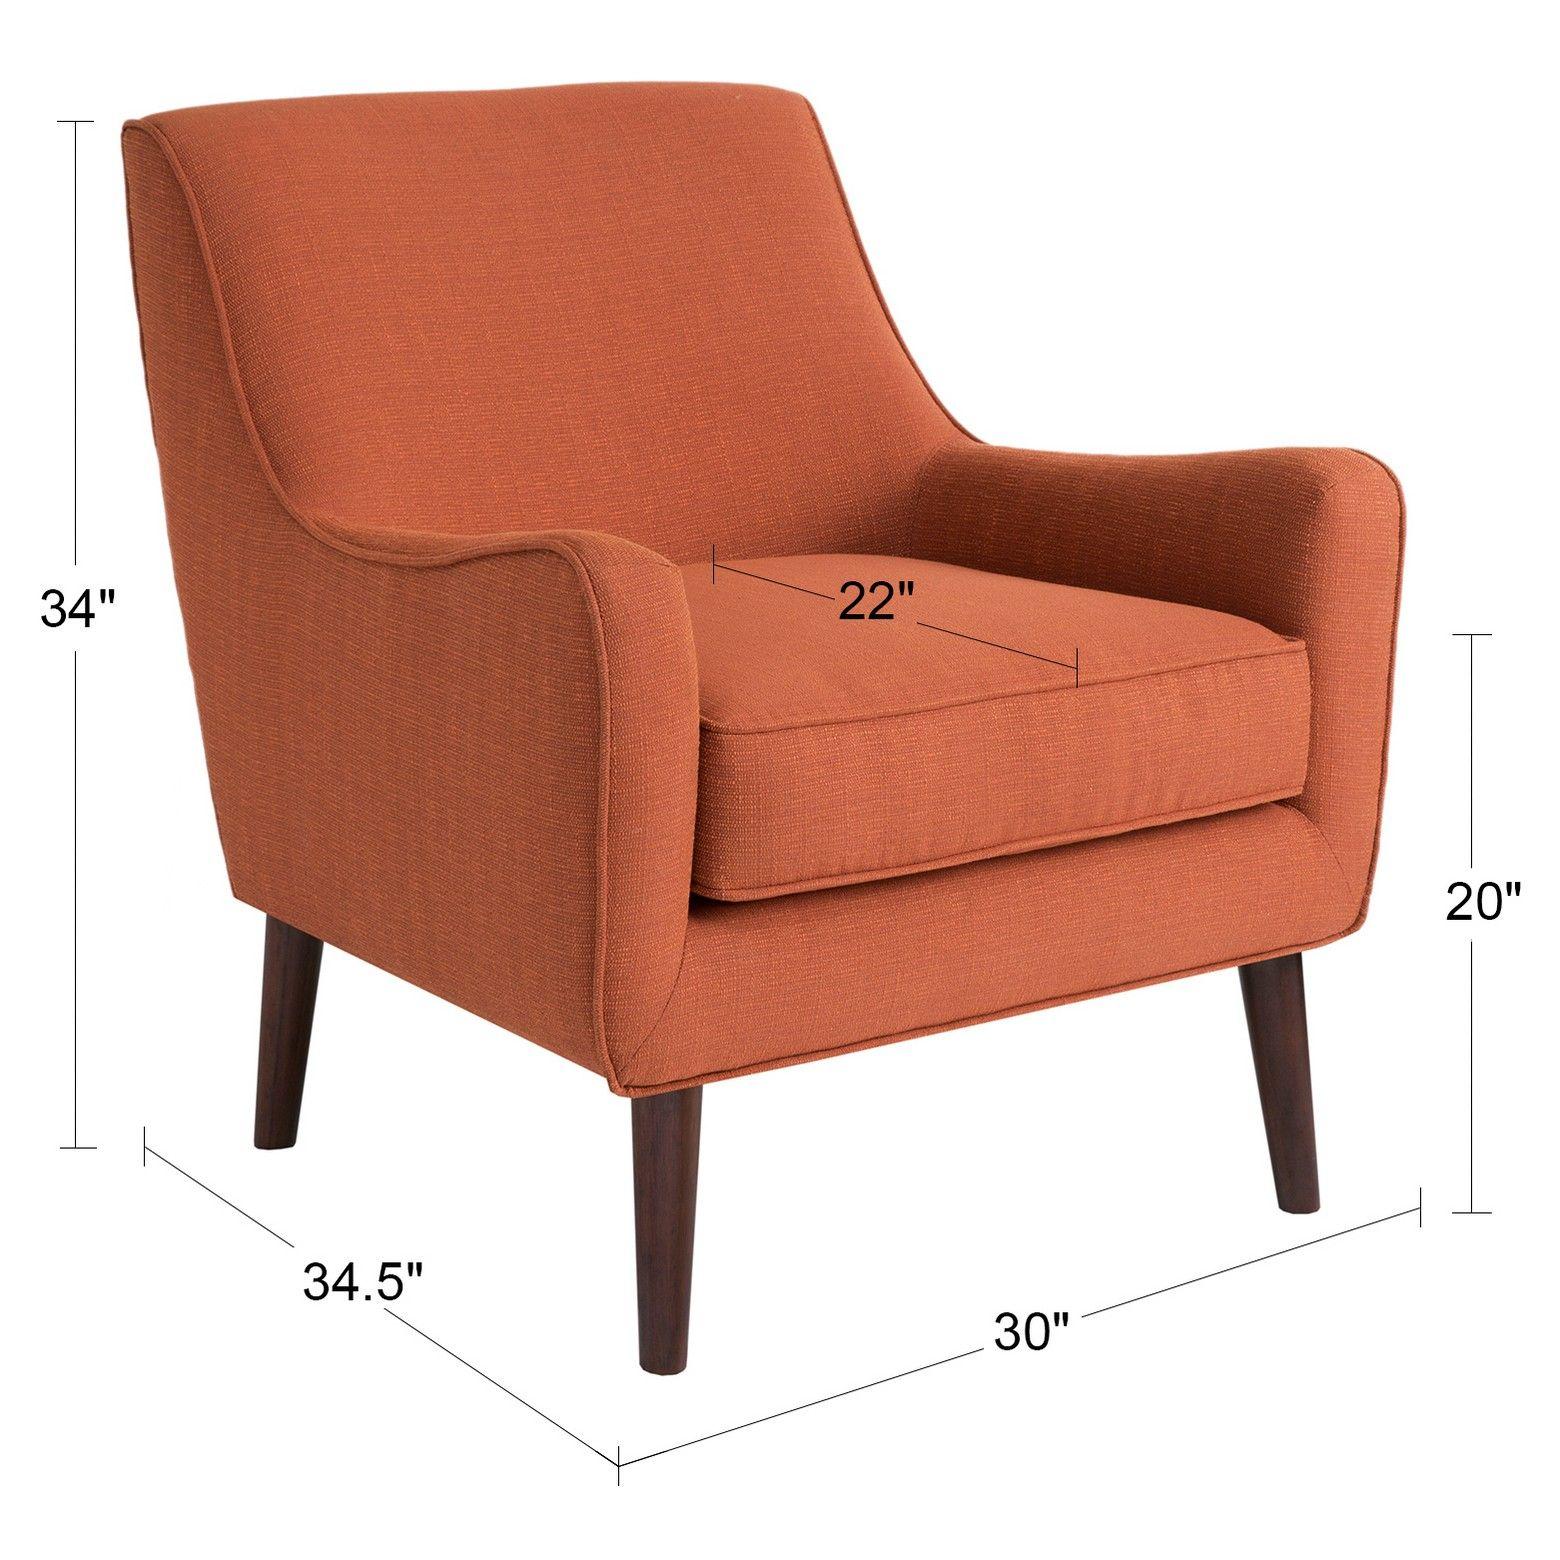 Nathan Chair Mid Century Accent Chair Armchair Furniture